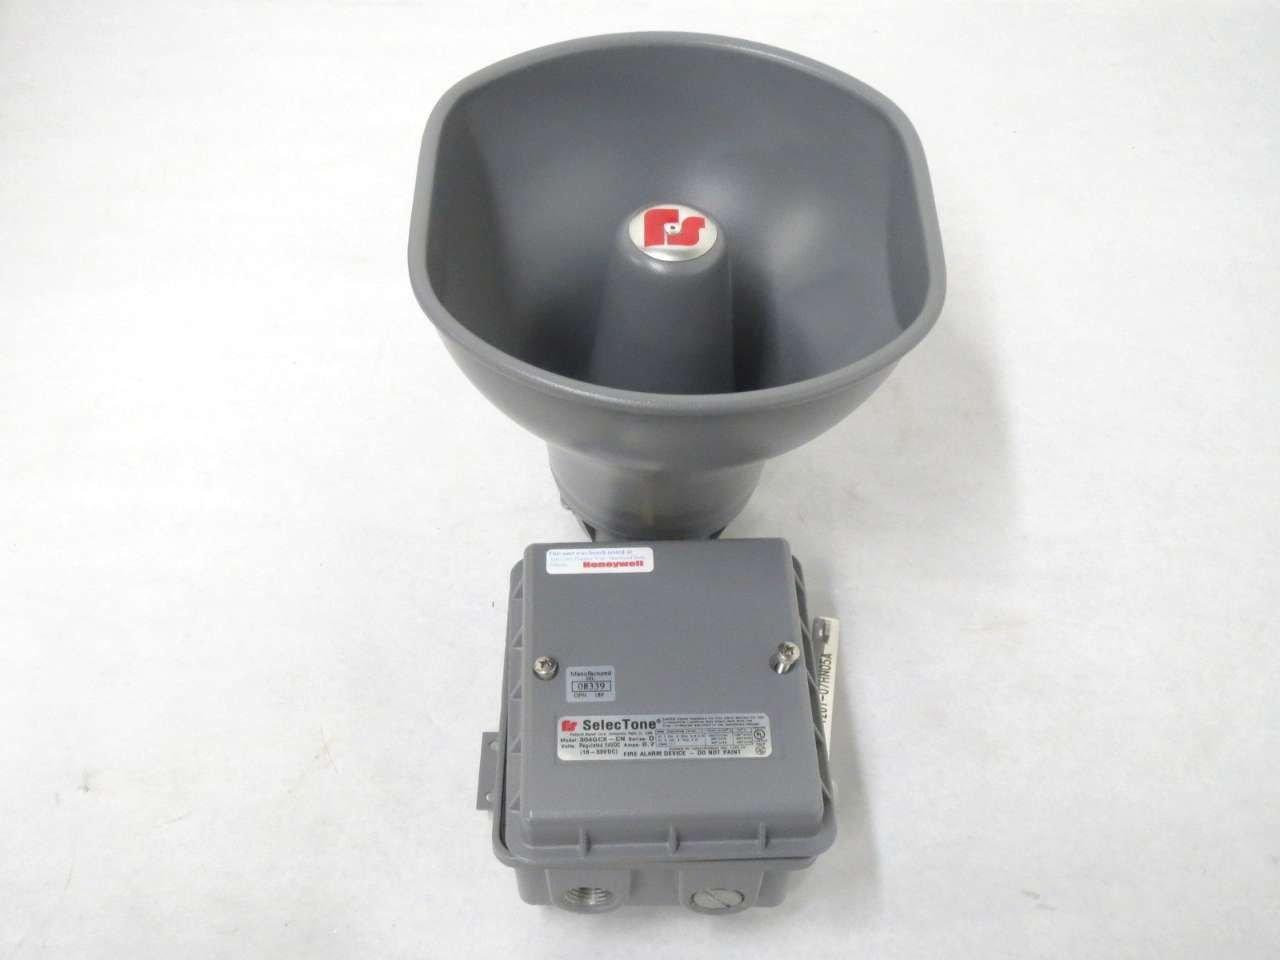 304GCX-024 SelecTone ® Hazardous  Location Audible  Signaling Device Federal Signal